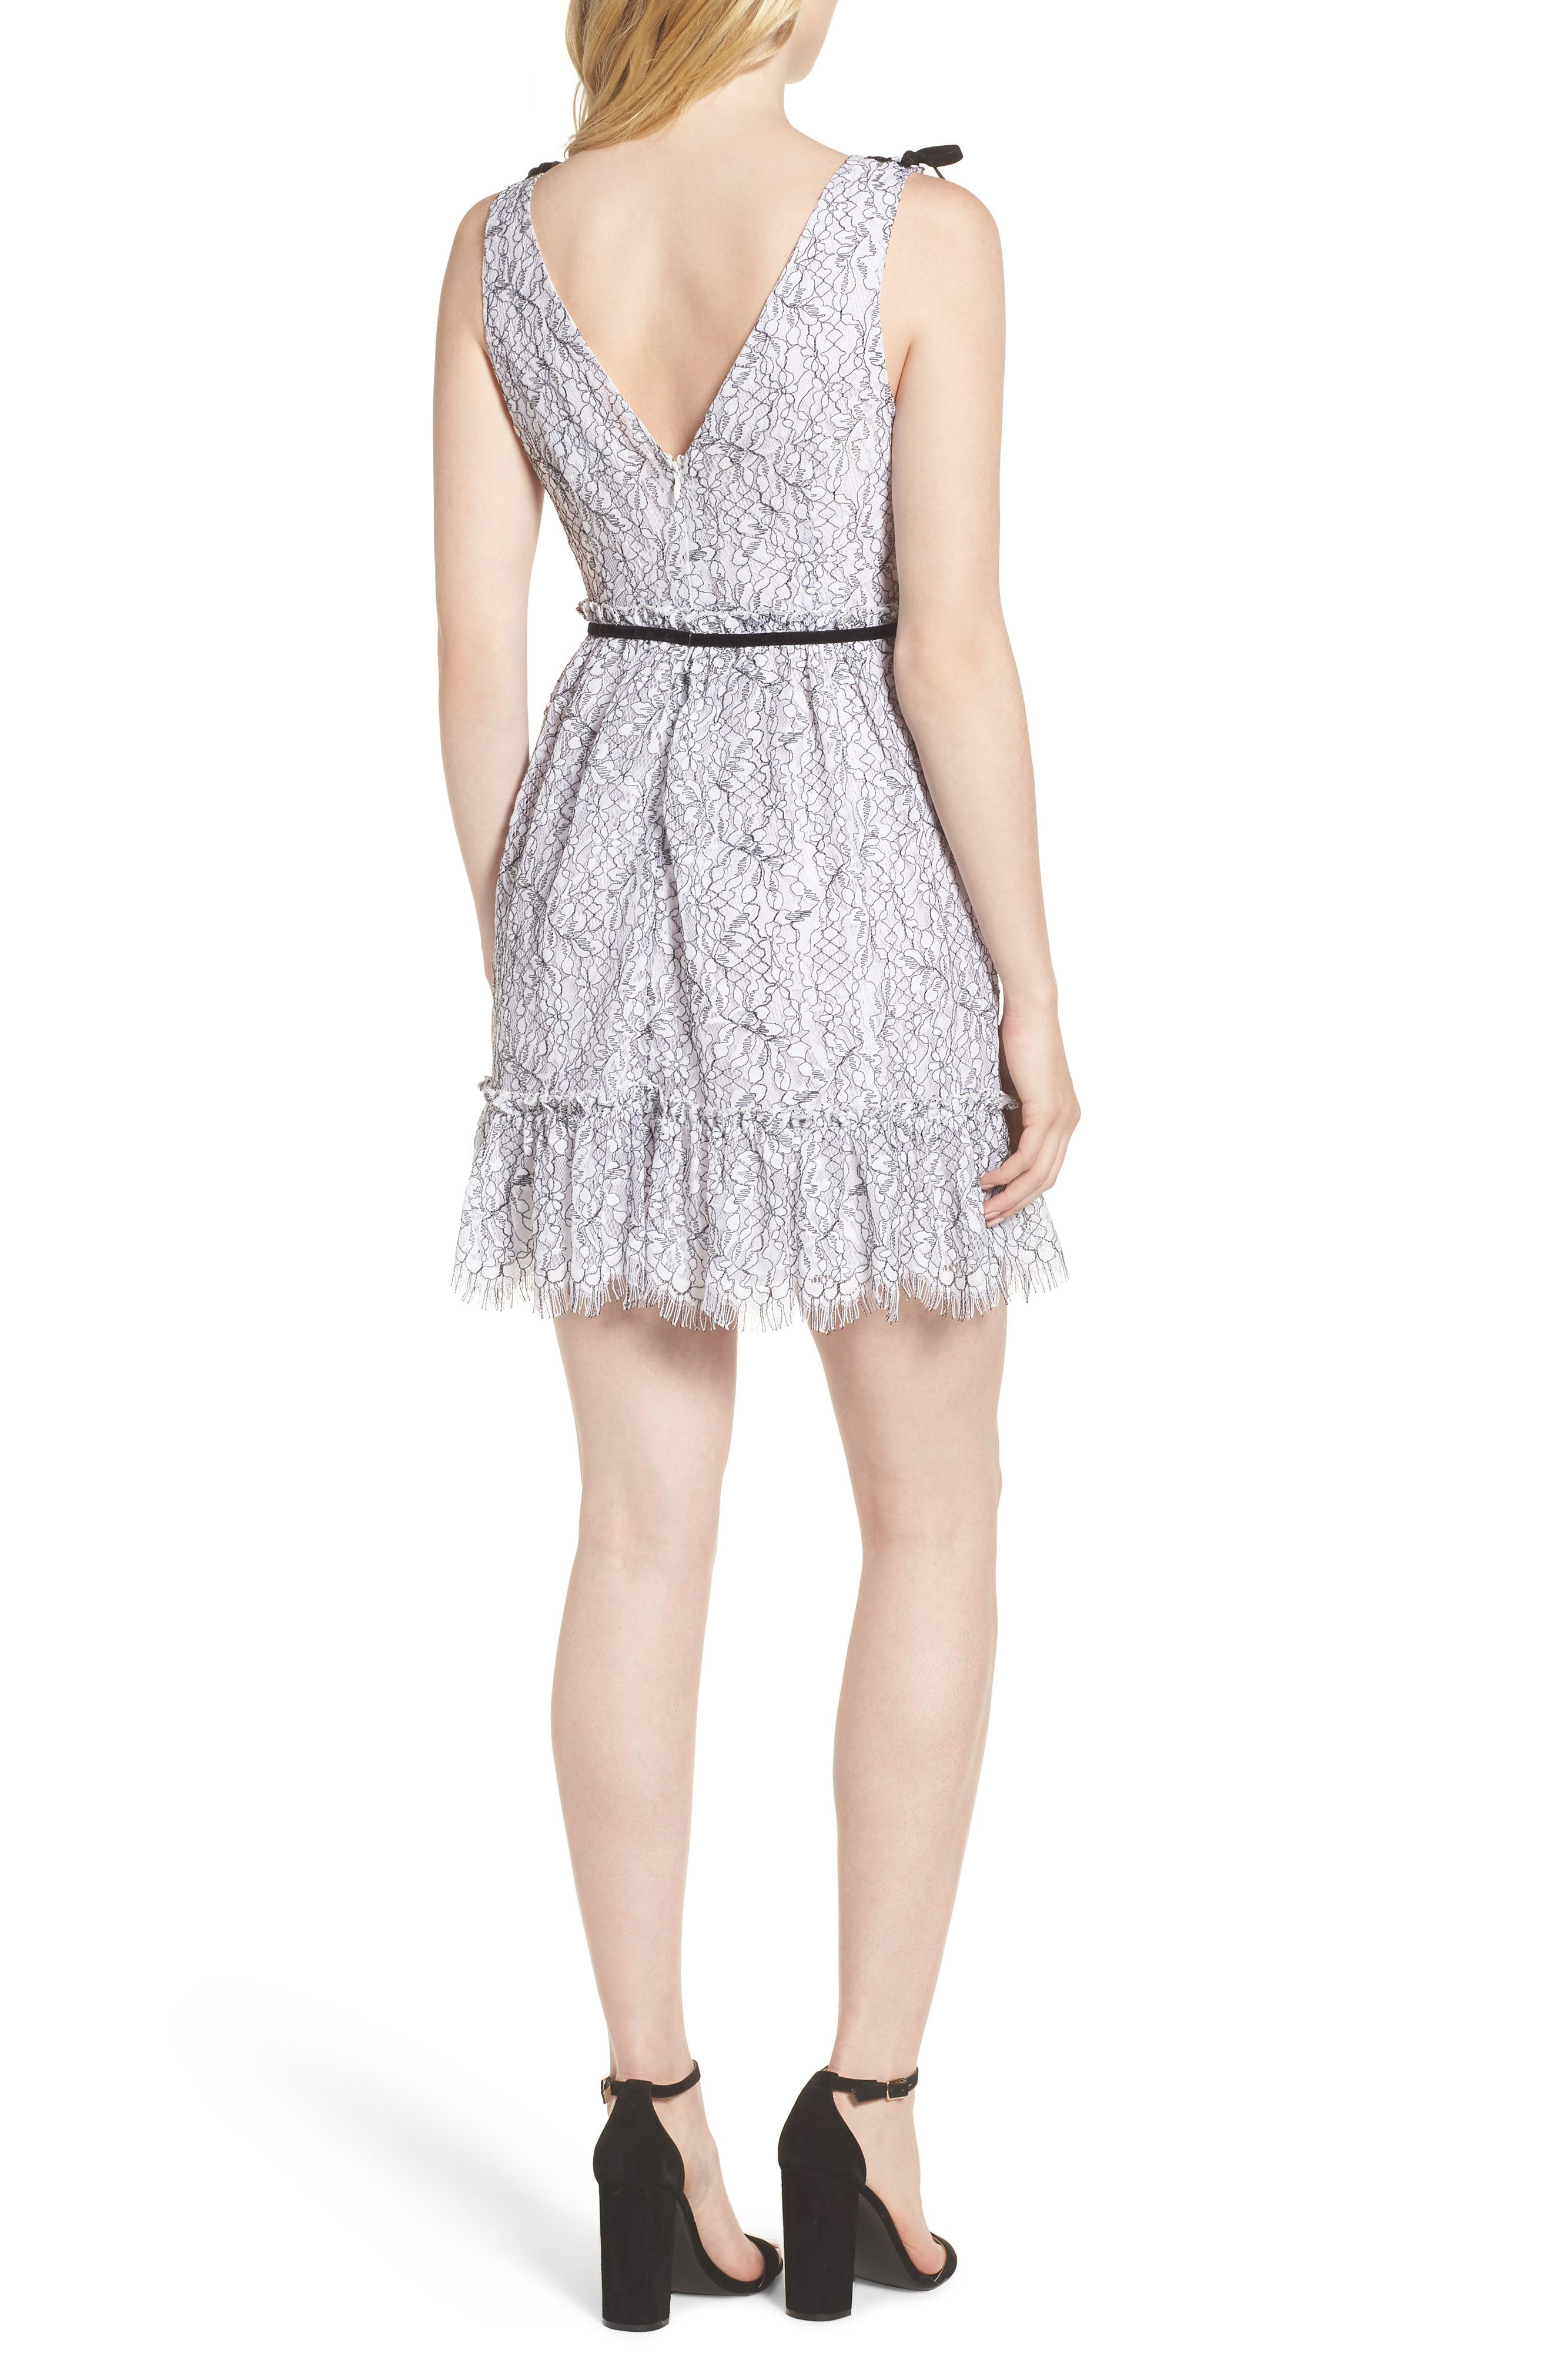 Ezzy Lace Dress,                             Alternate thumbnail 2, color,                             IVORY